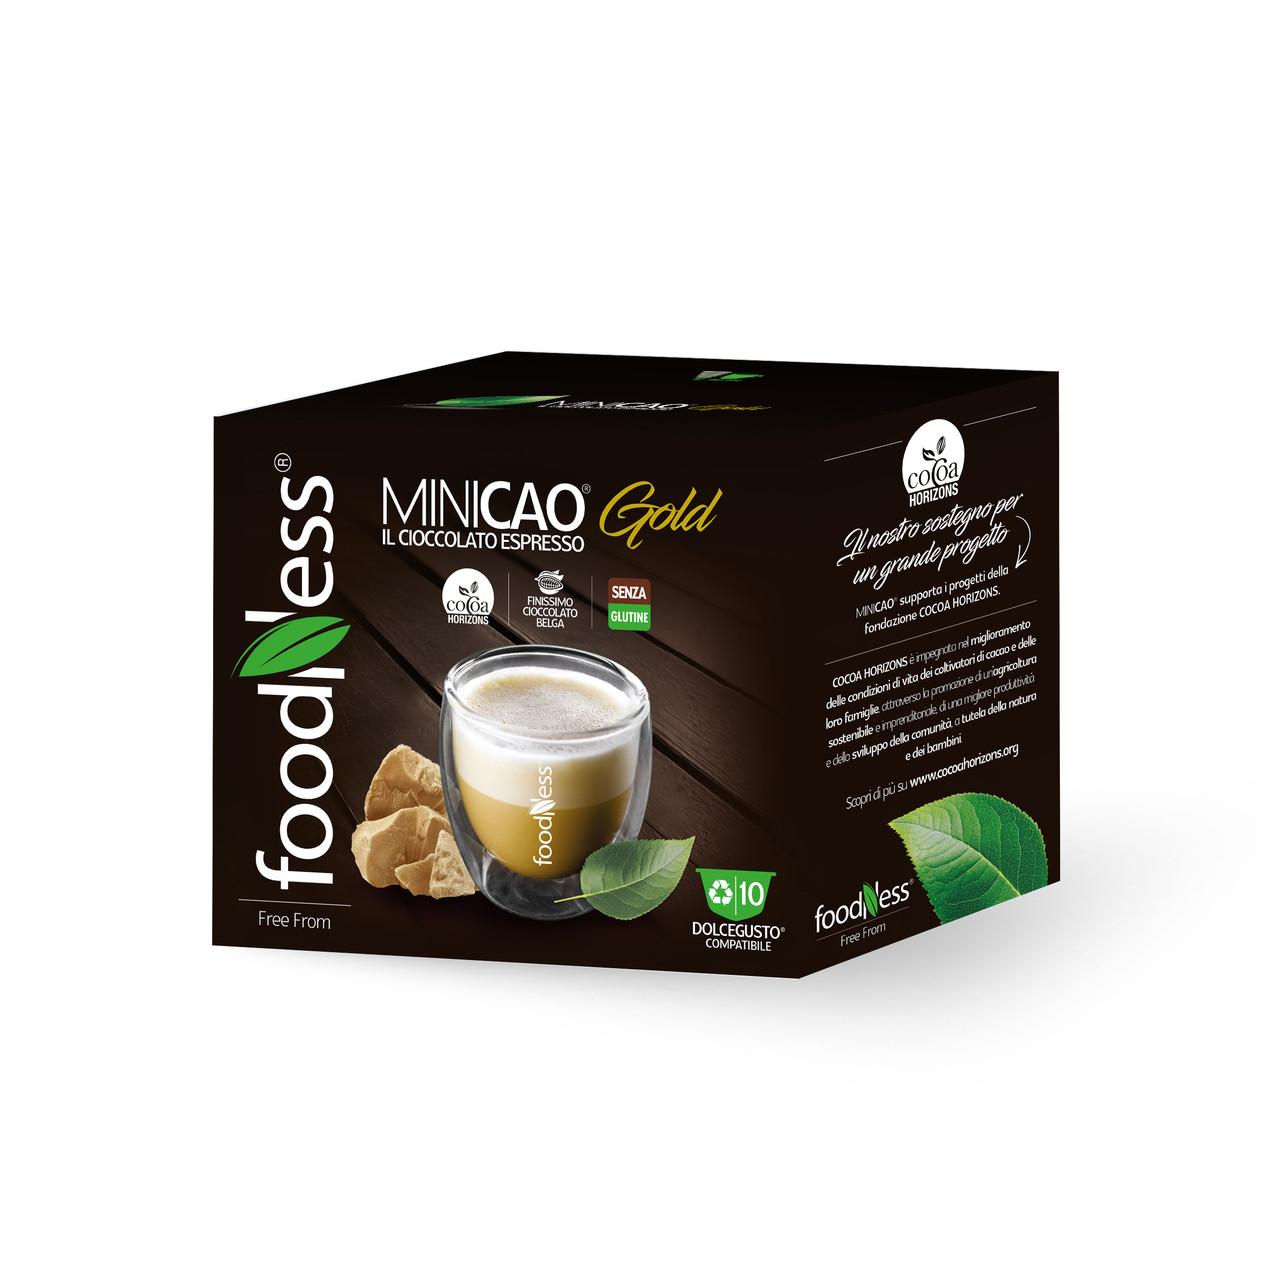 Шоколад в капсулах FoodNess Dolce Gusto Minicao Gold The Cocoa Espresso 10 шт. (Фуднес Дольче Густо), Италия